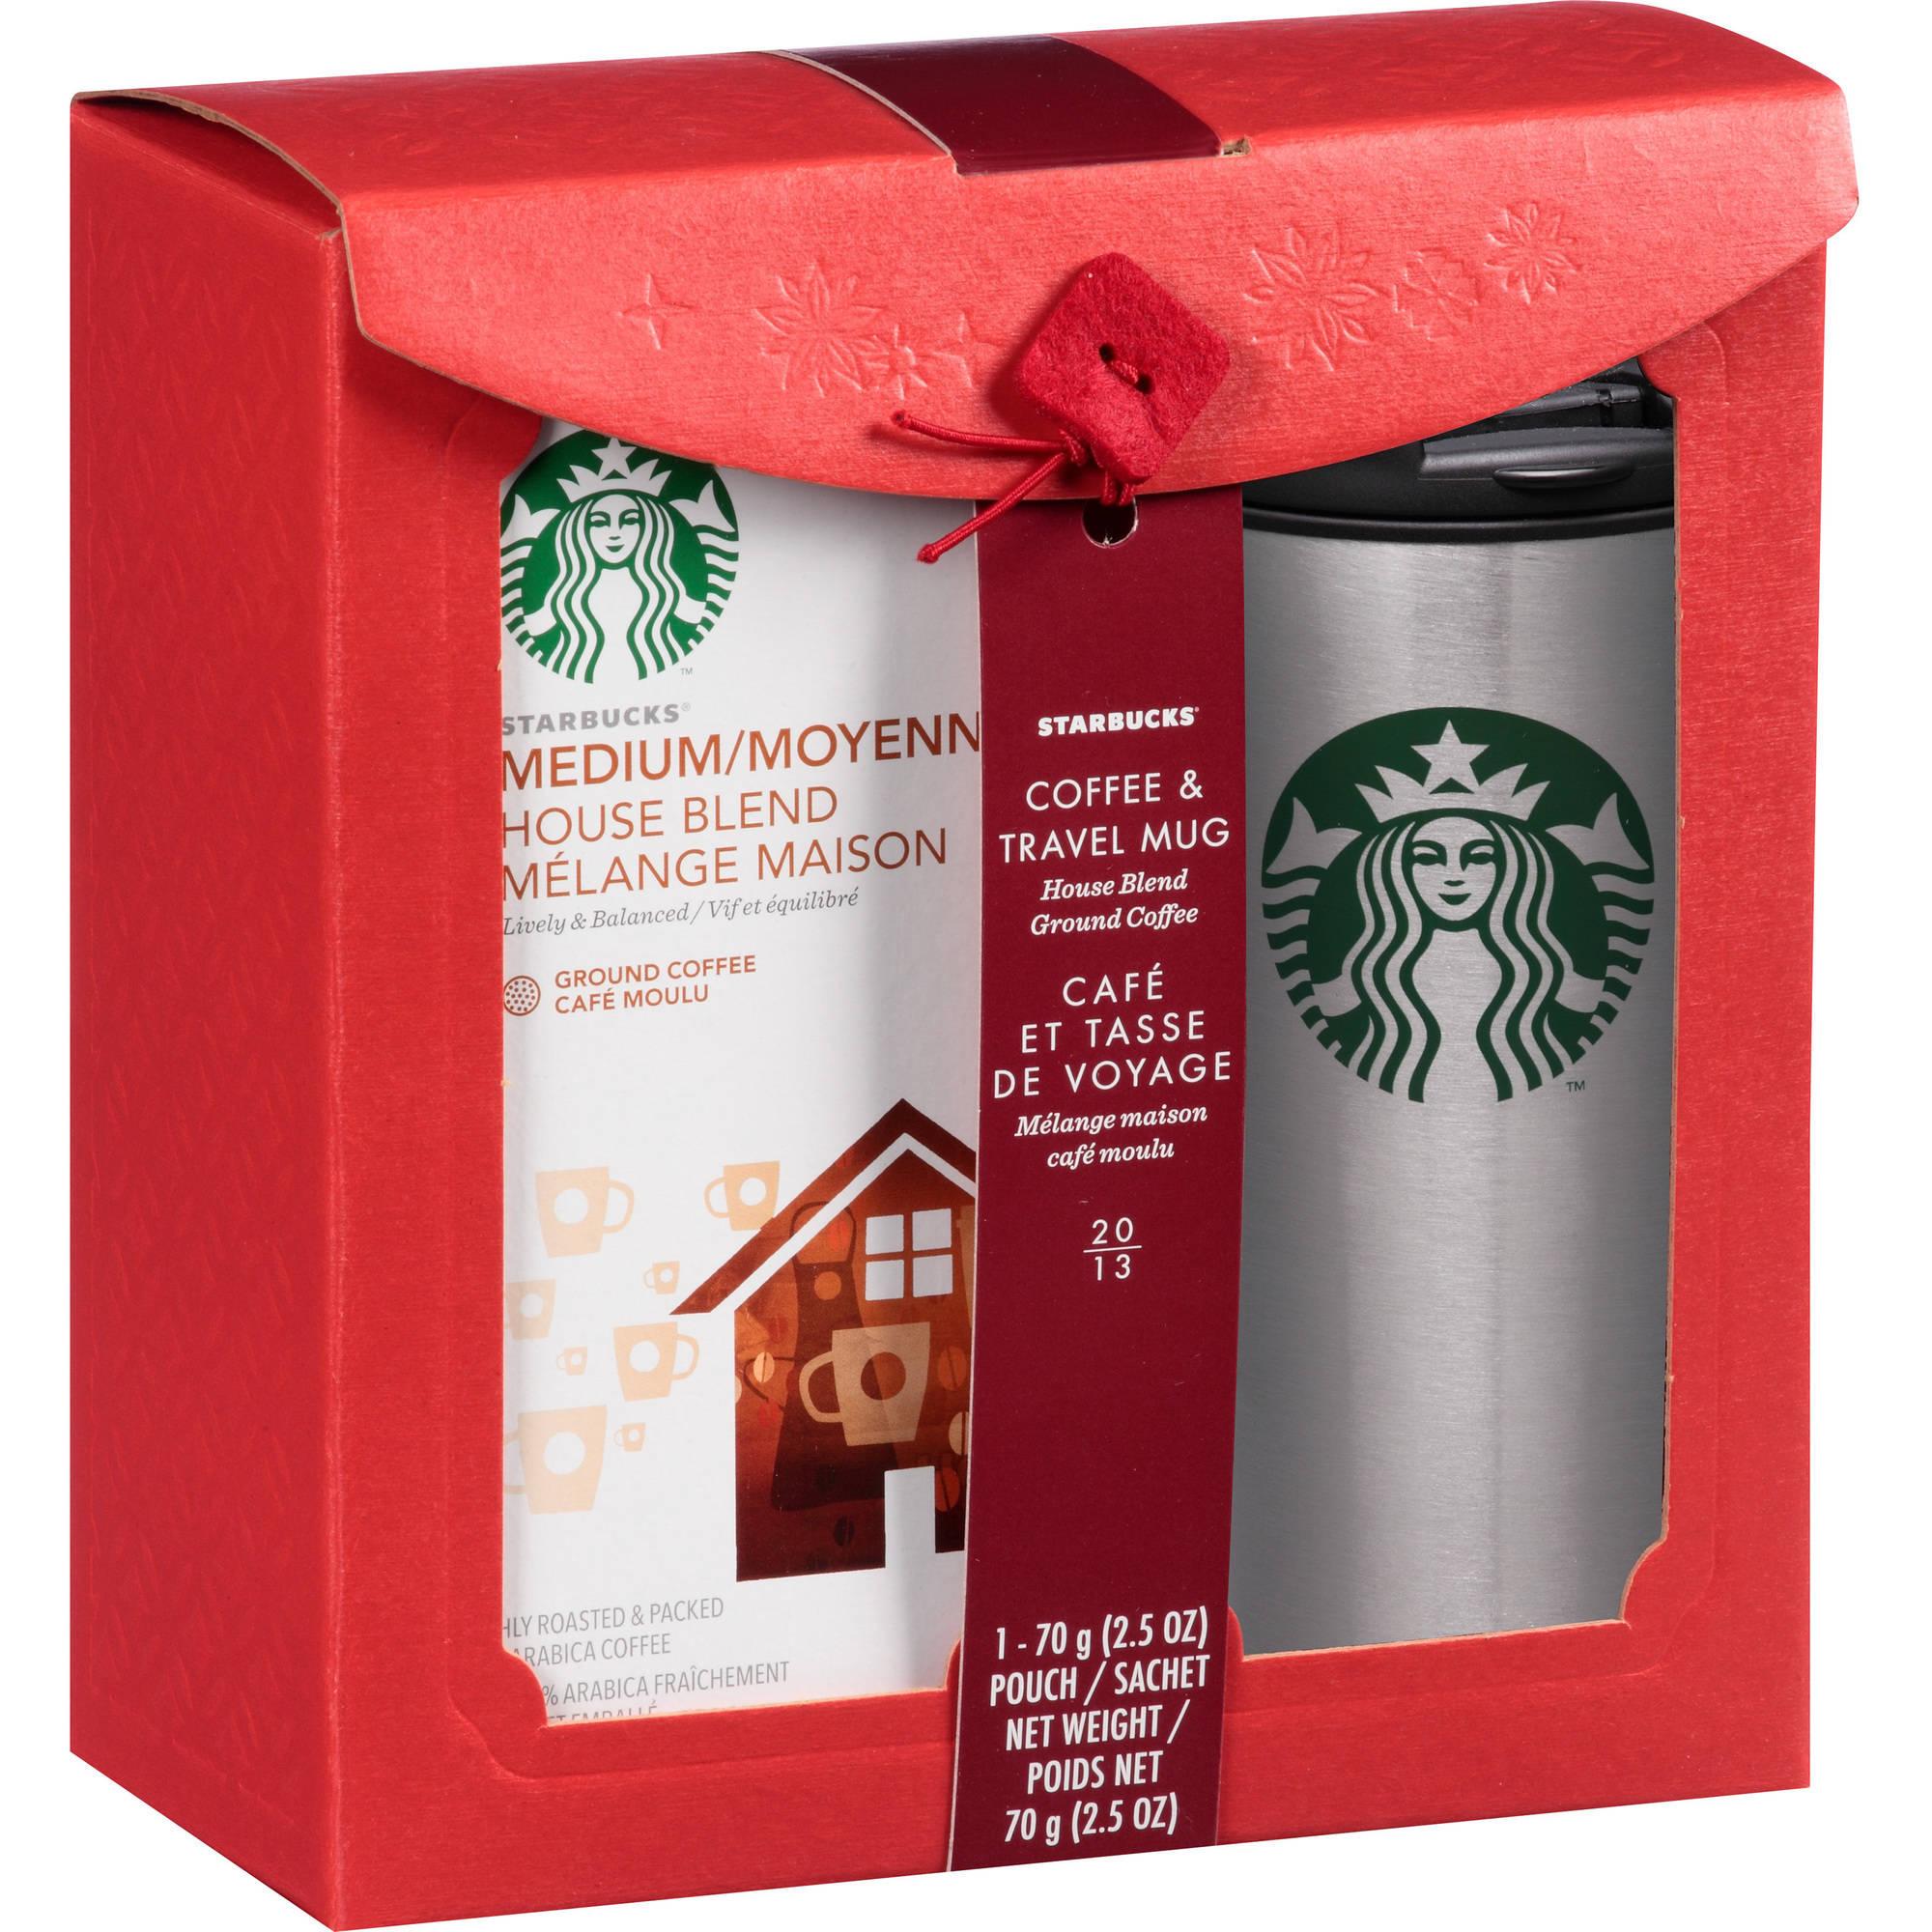 Starbucks Holiday Travel Mug Set with House Blend Coffee, 2 pc